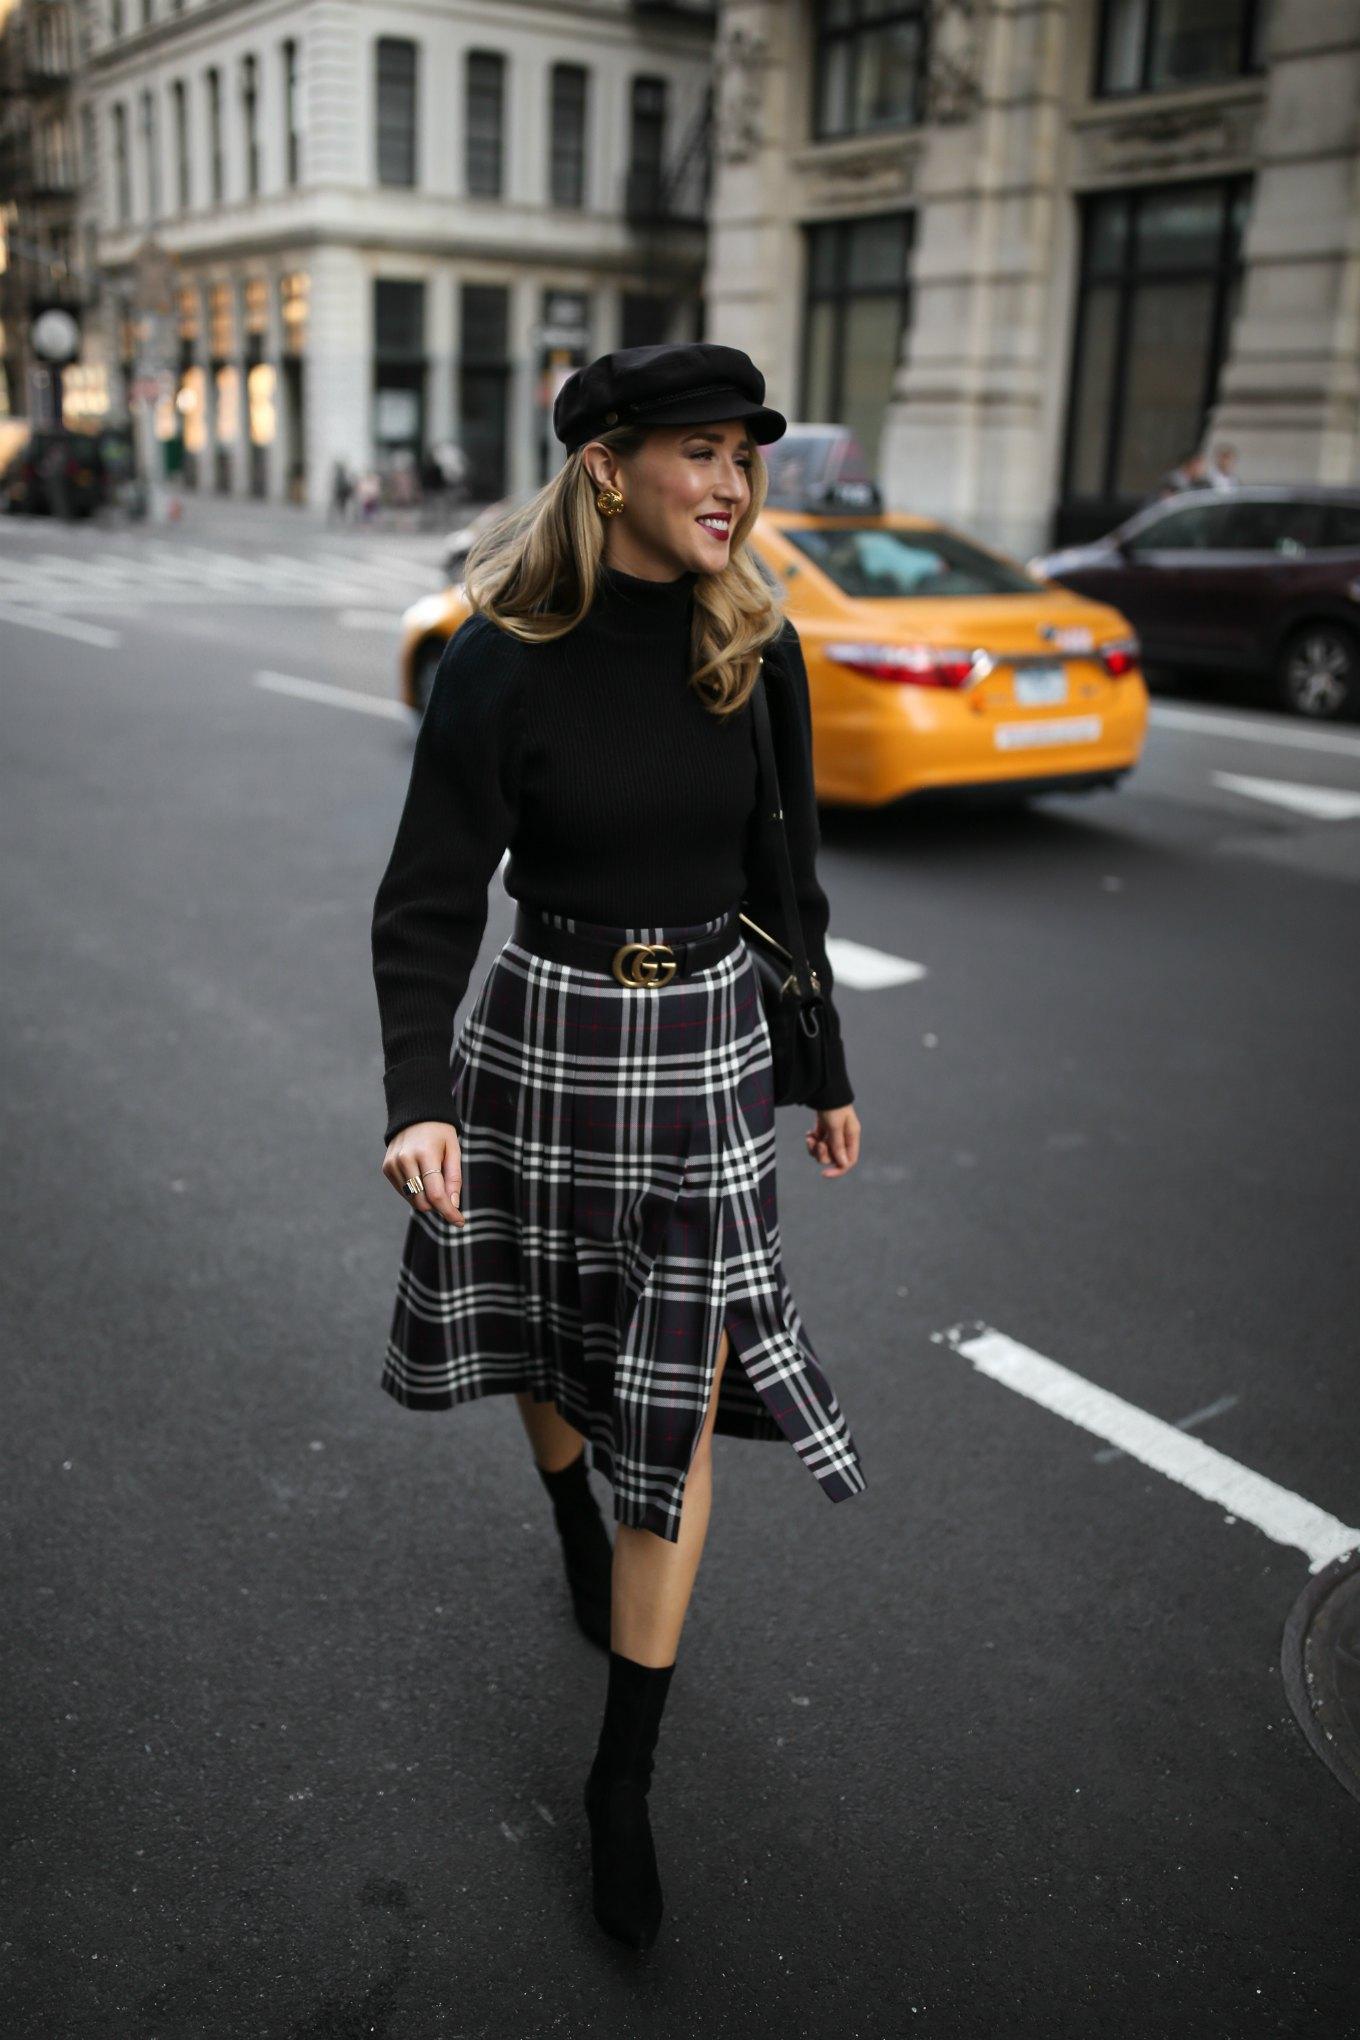 Mary Orton wears a Burberry plaid checked midi skirt, a black puffed-shoulder turtleneck, black Stuart Weitzman sock boots and a black baker boy cap